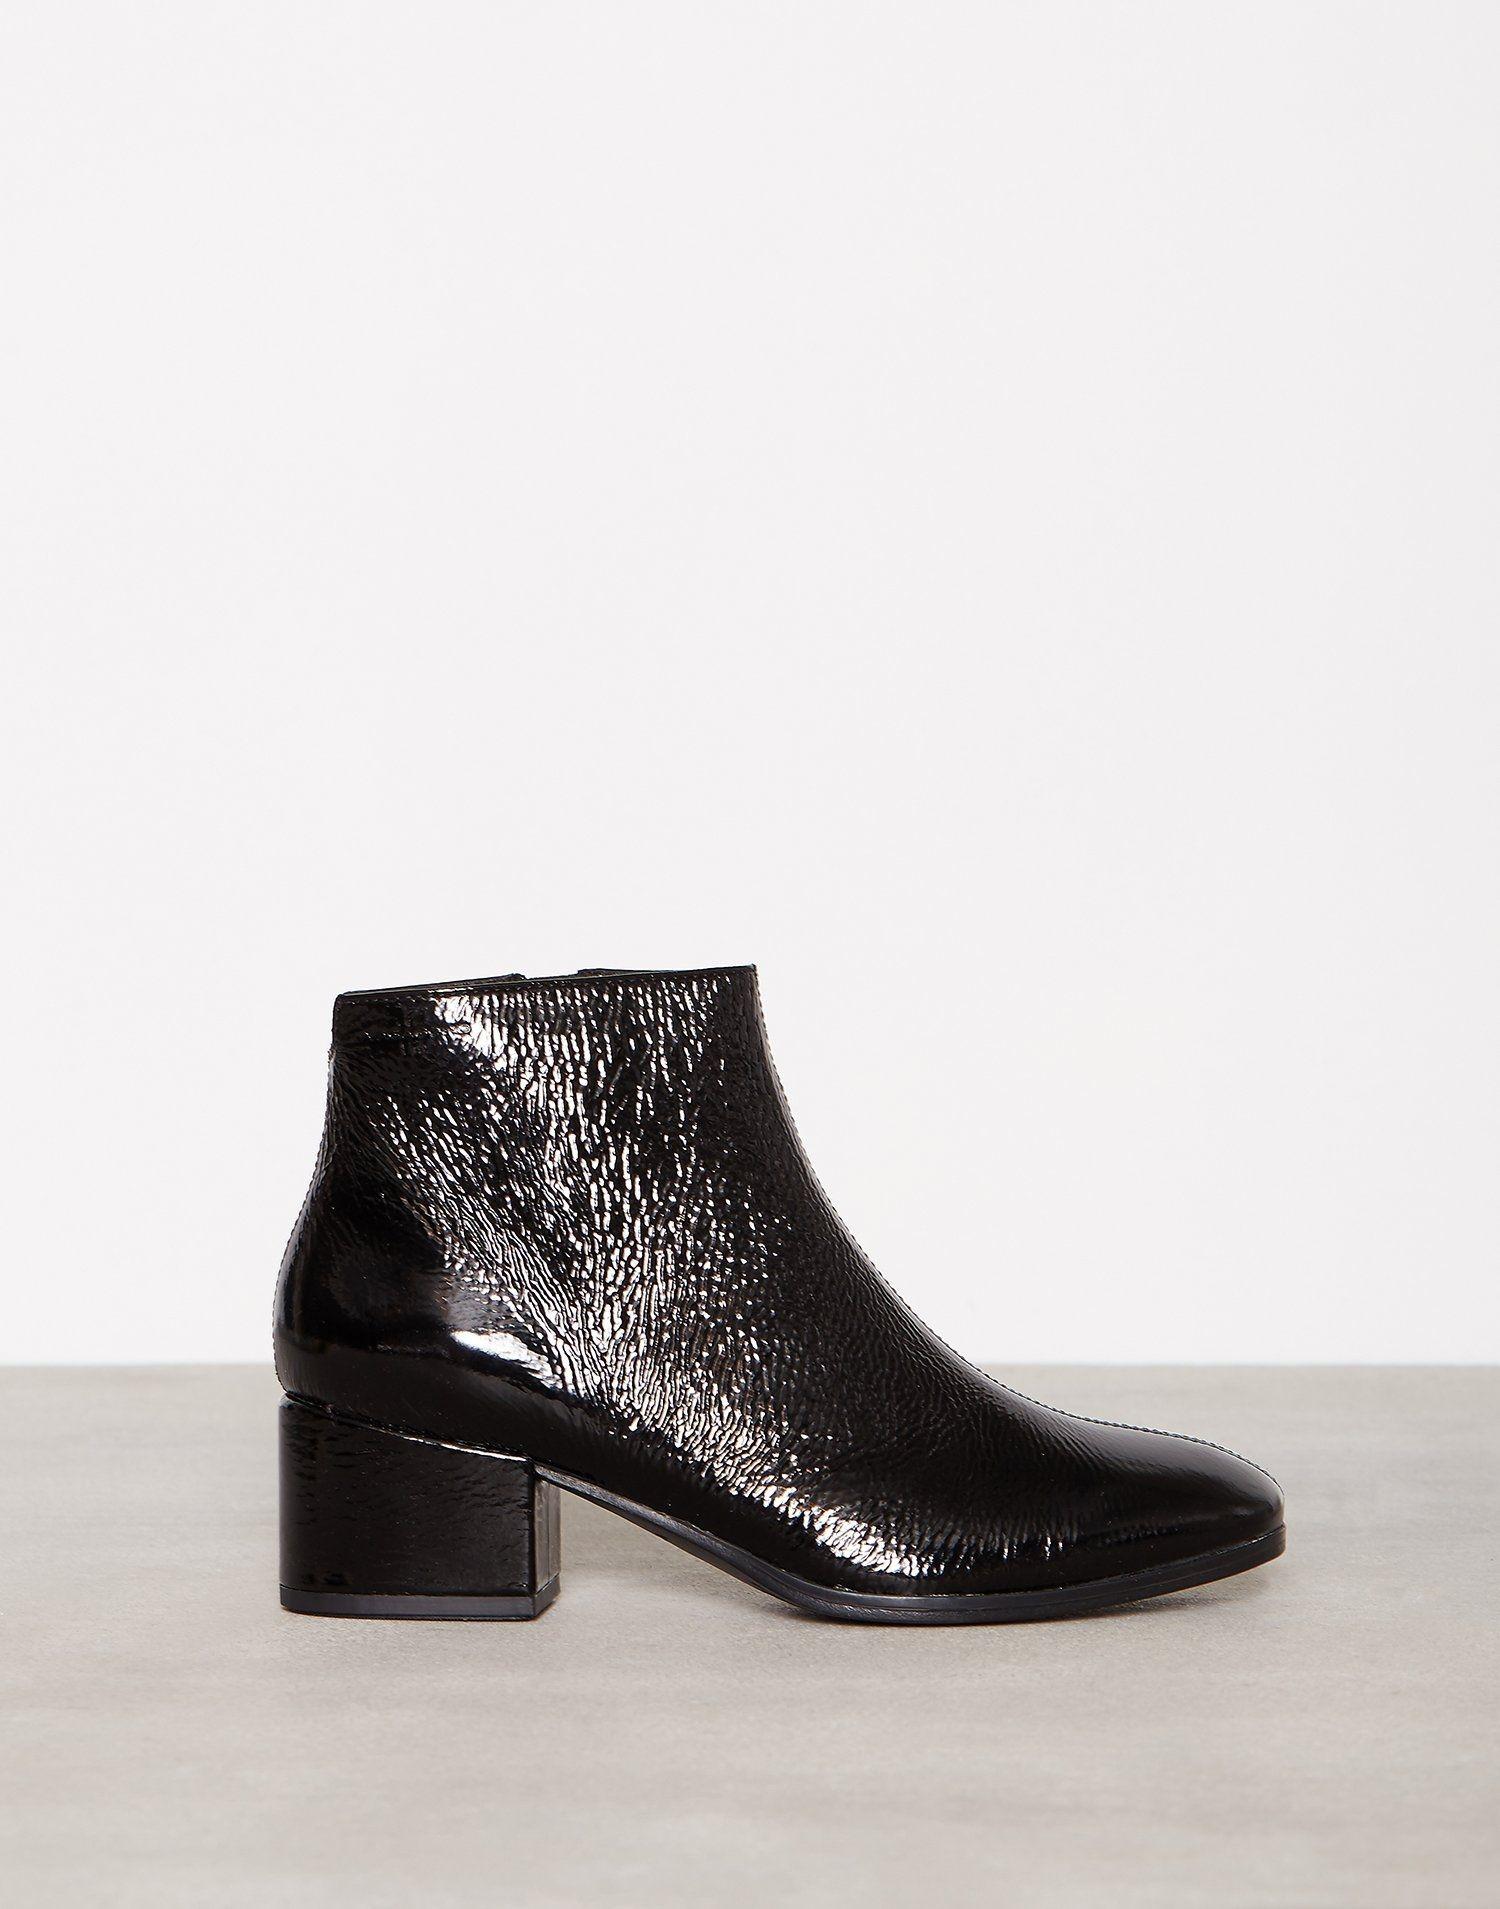 Daisy - Vagabond - Svart - Boots - Sko - Kvinne - Nelly.com  b680ab4e7184c